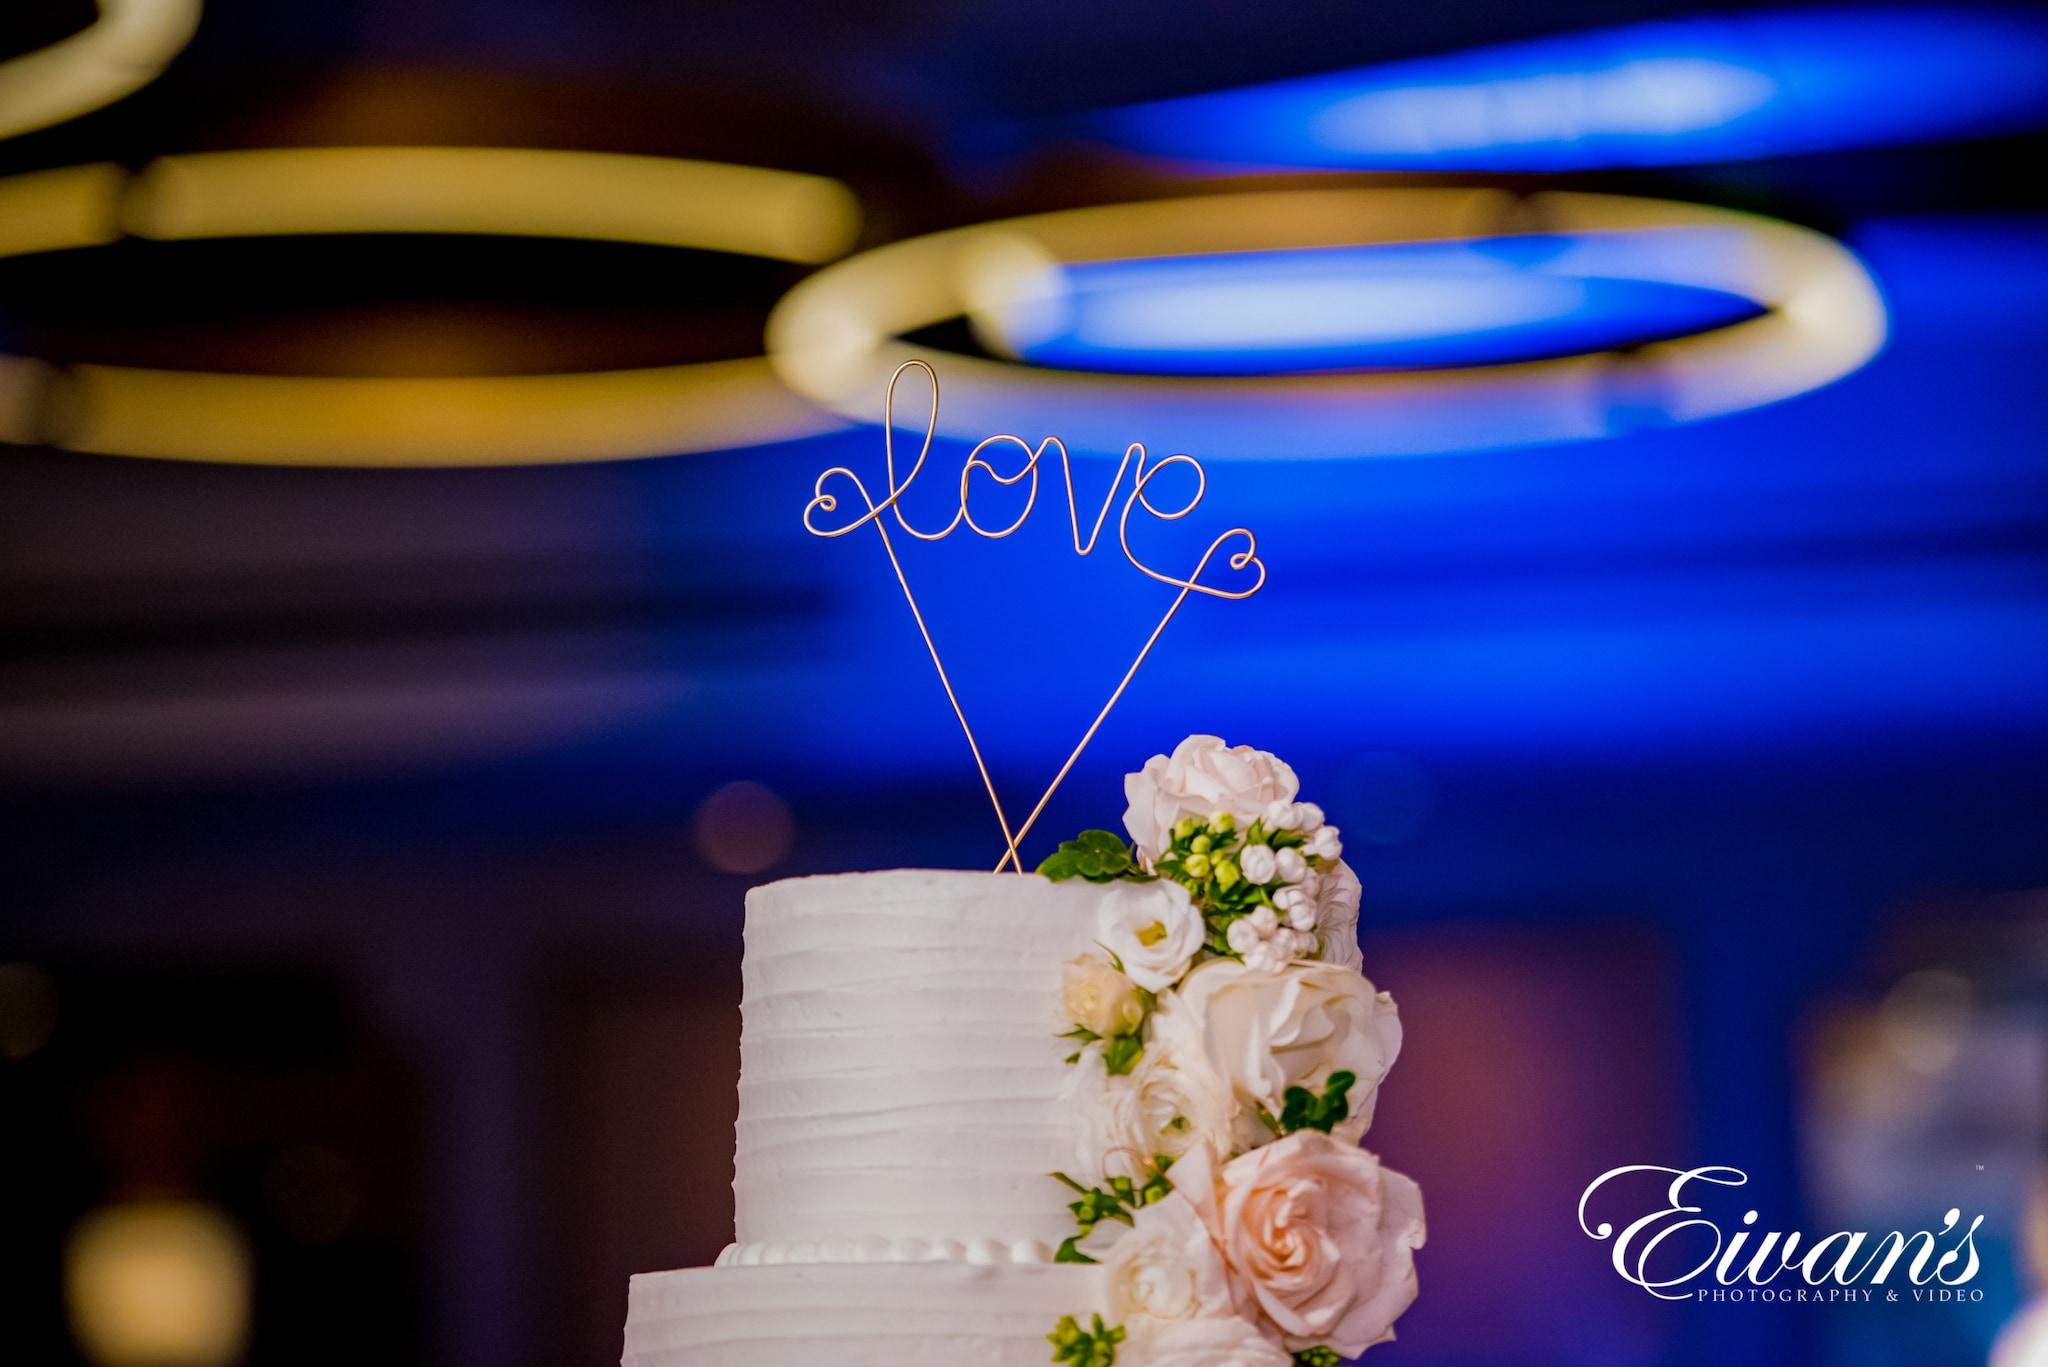 image of a wedding cake